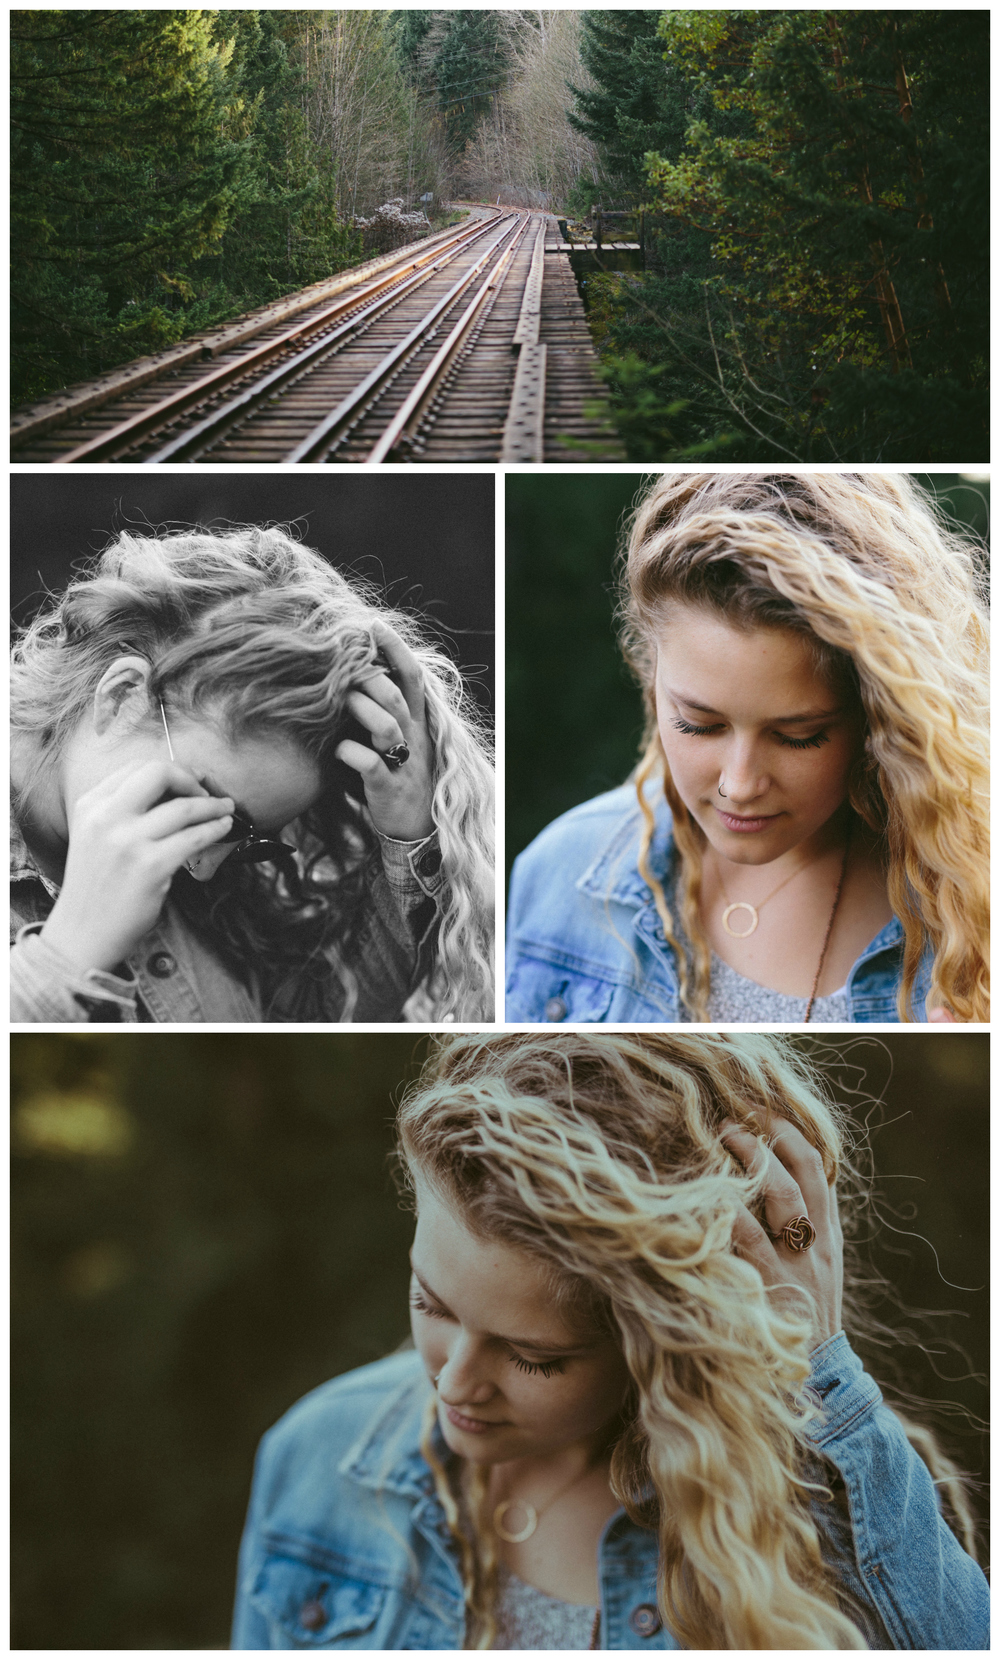 breanna-blog-2.jpg